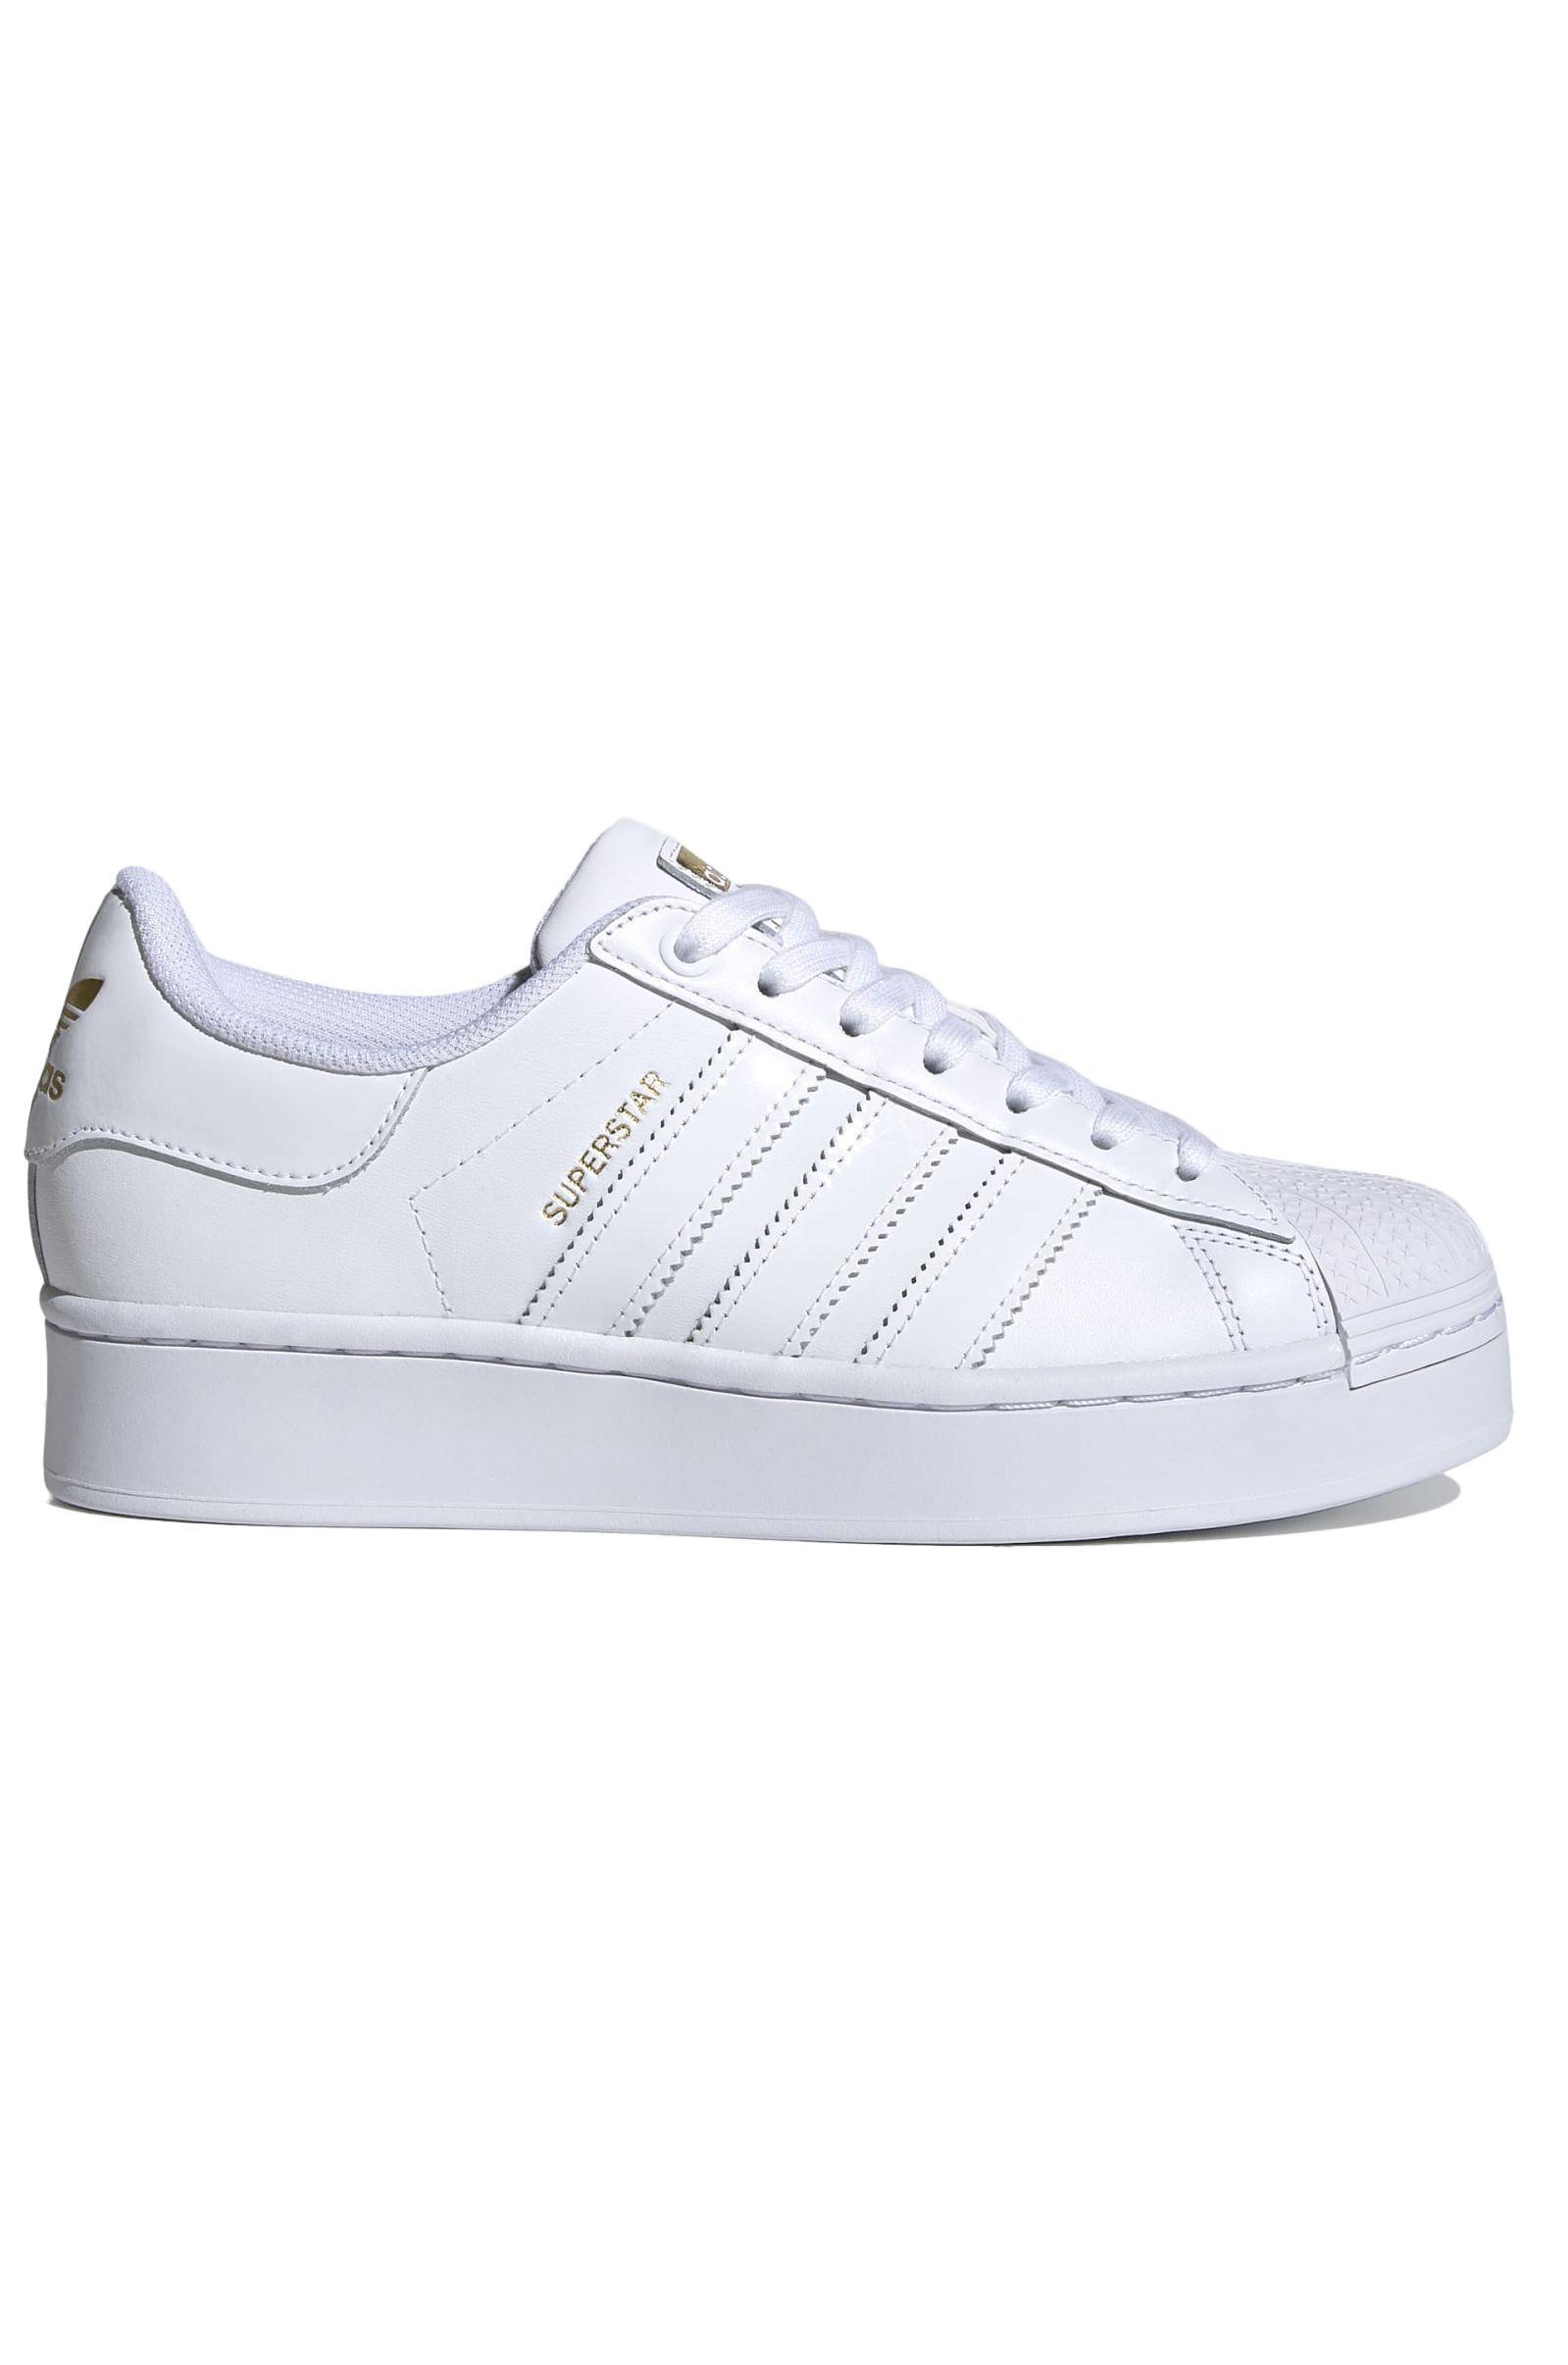 Adidas Shoes SUPERSTAR BOLD W Ftwrwhite